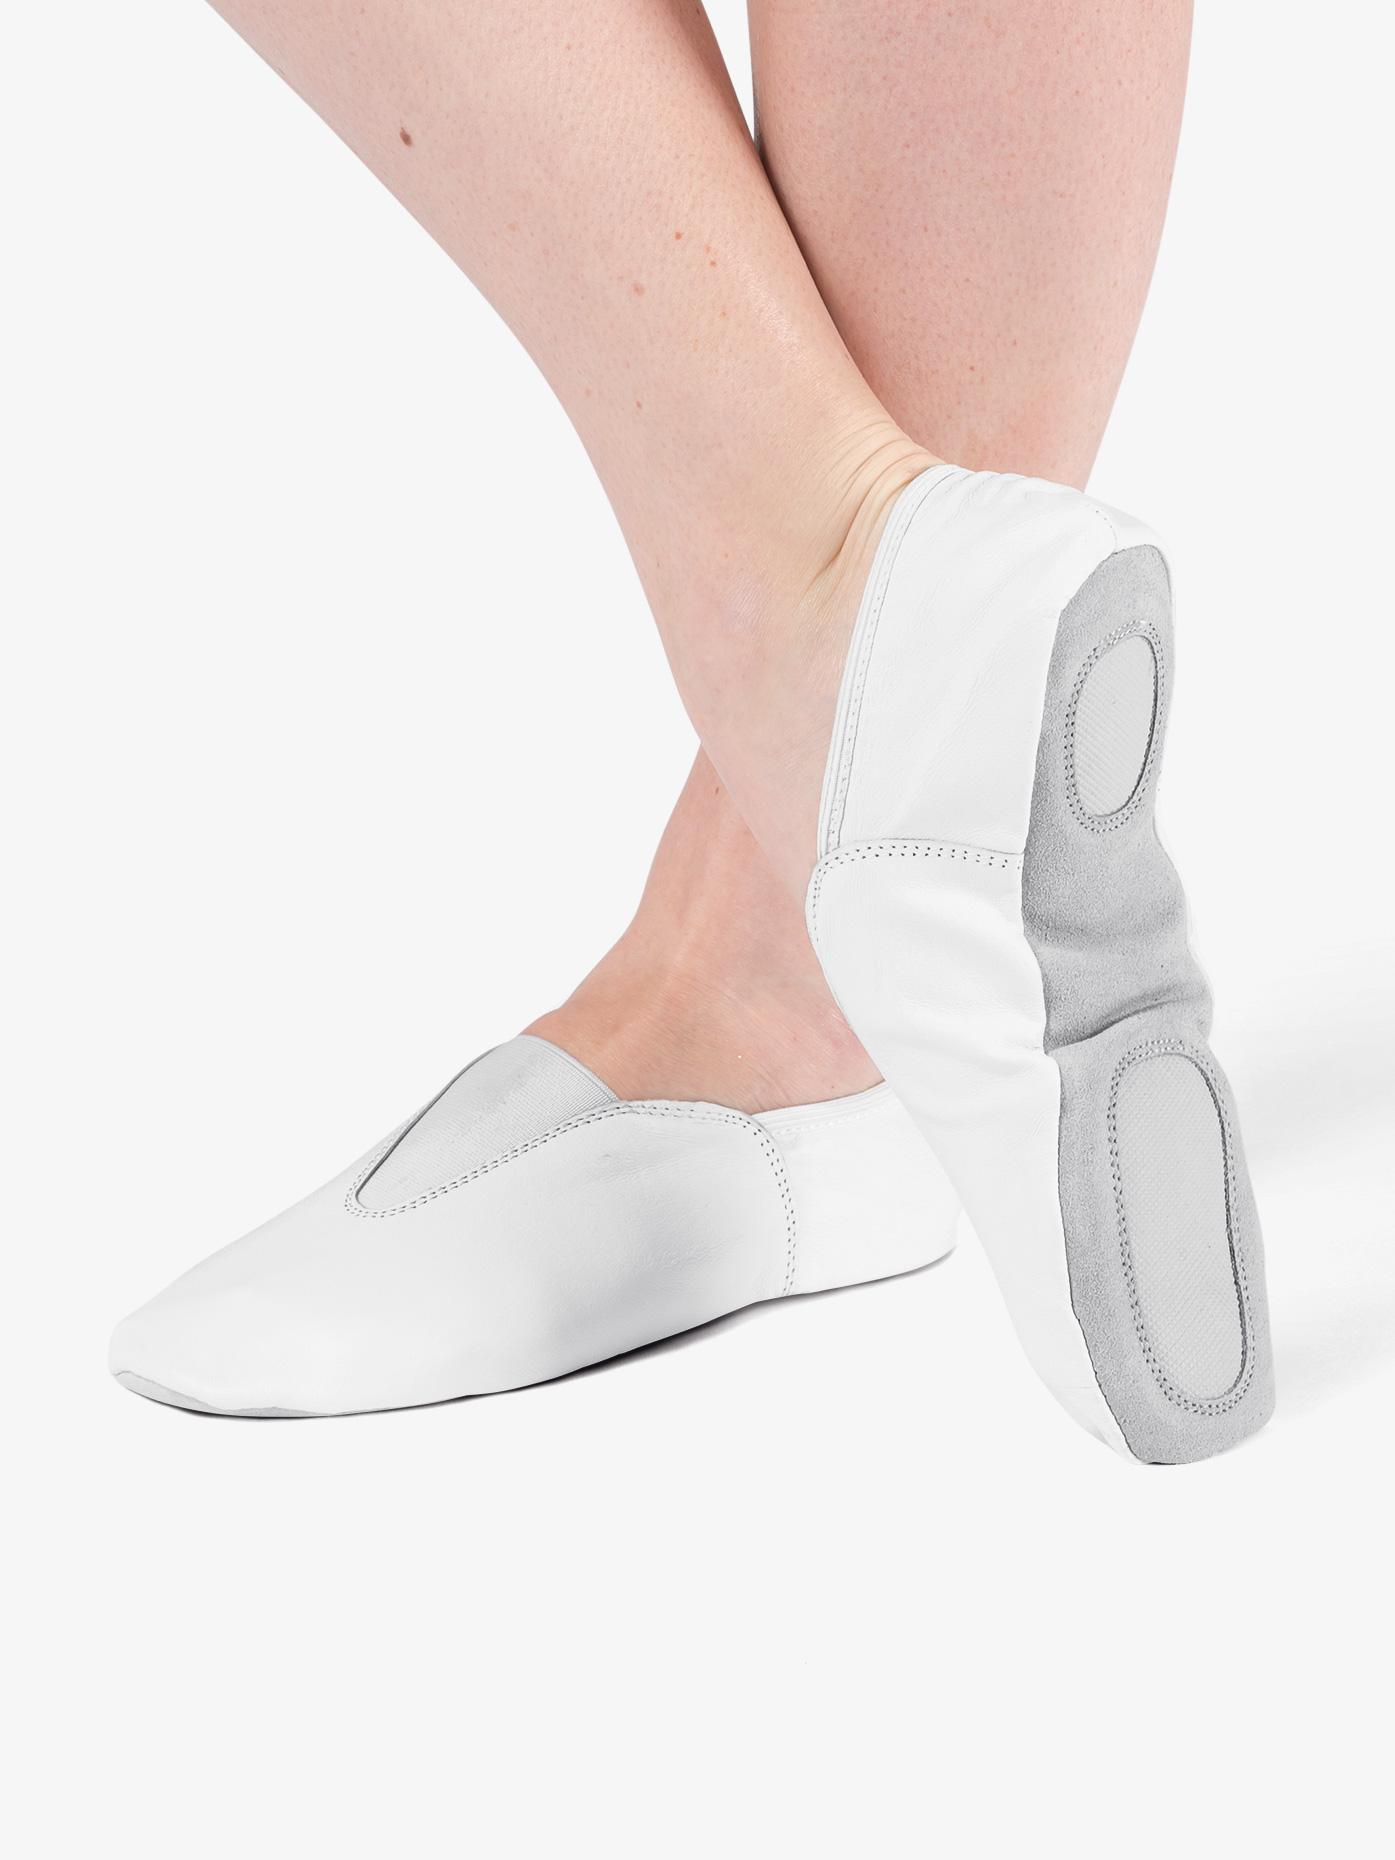 Theatricals Girls Split Sole Gym Shoes T8302C